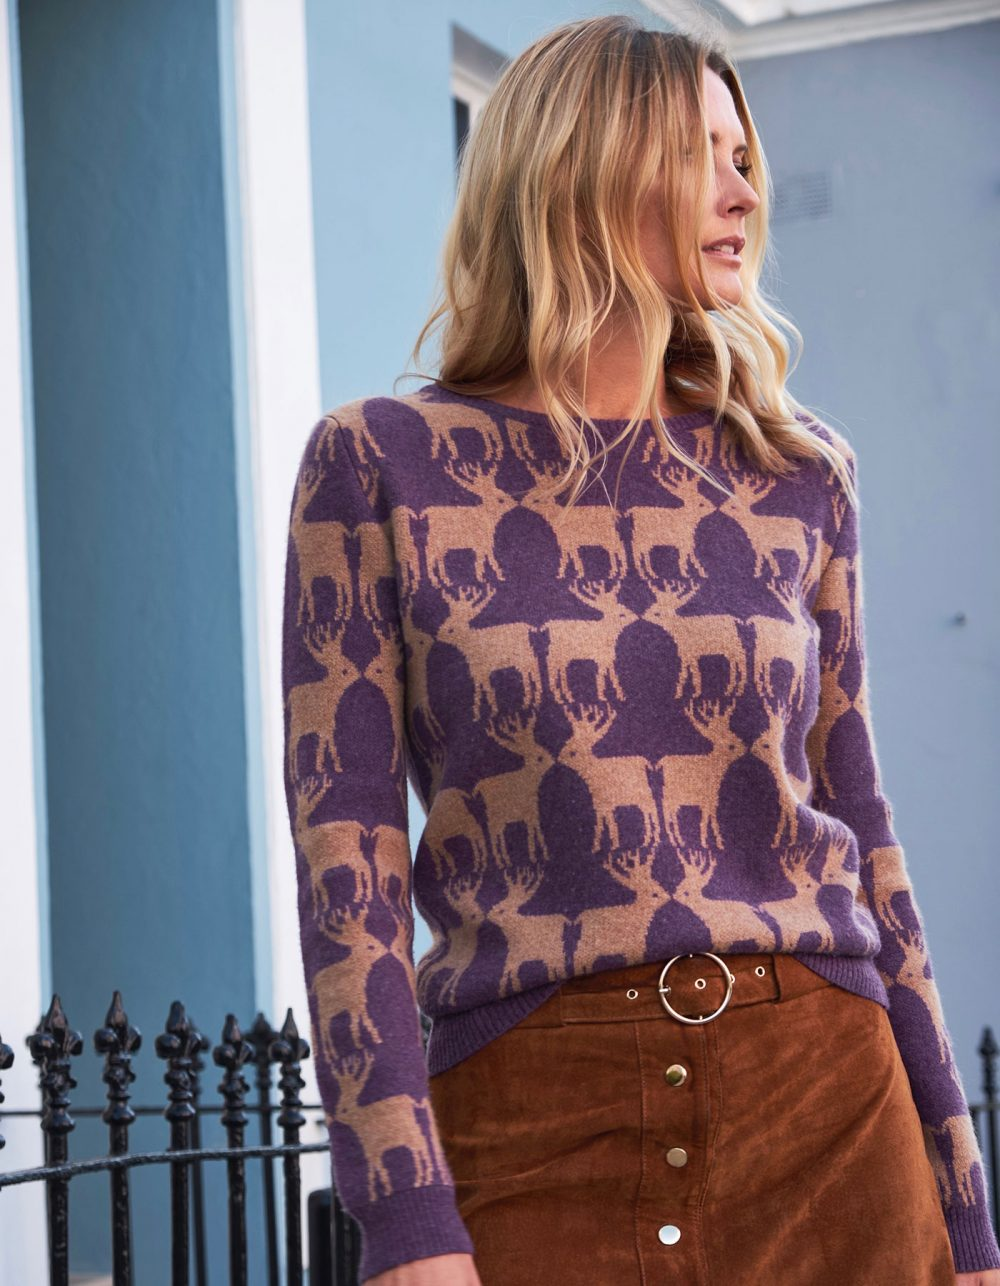 Woman by iron railings wearing cashmere knitwear, the malin darlin Reindeer purple cashmere jumper.